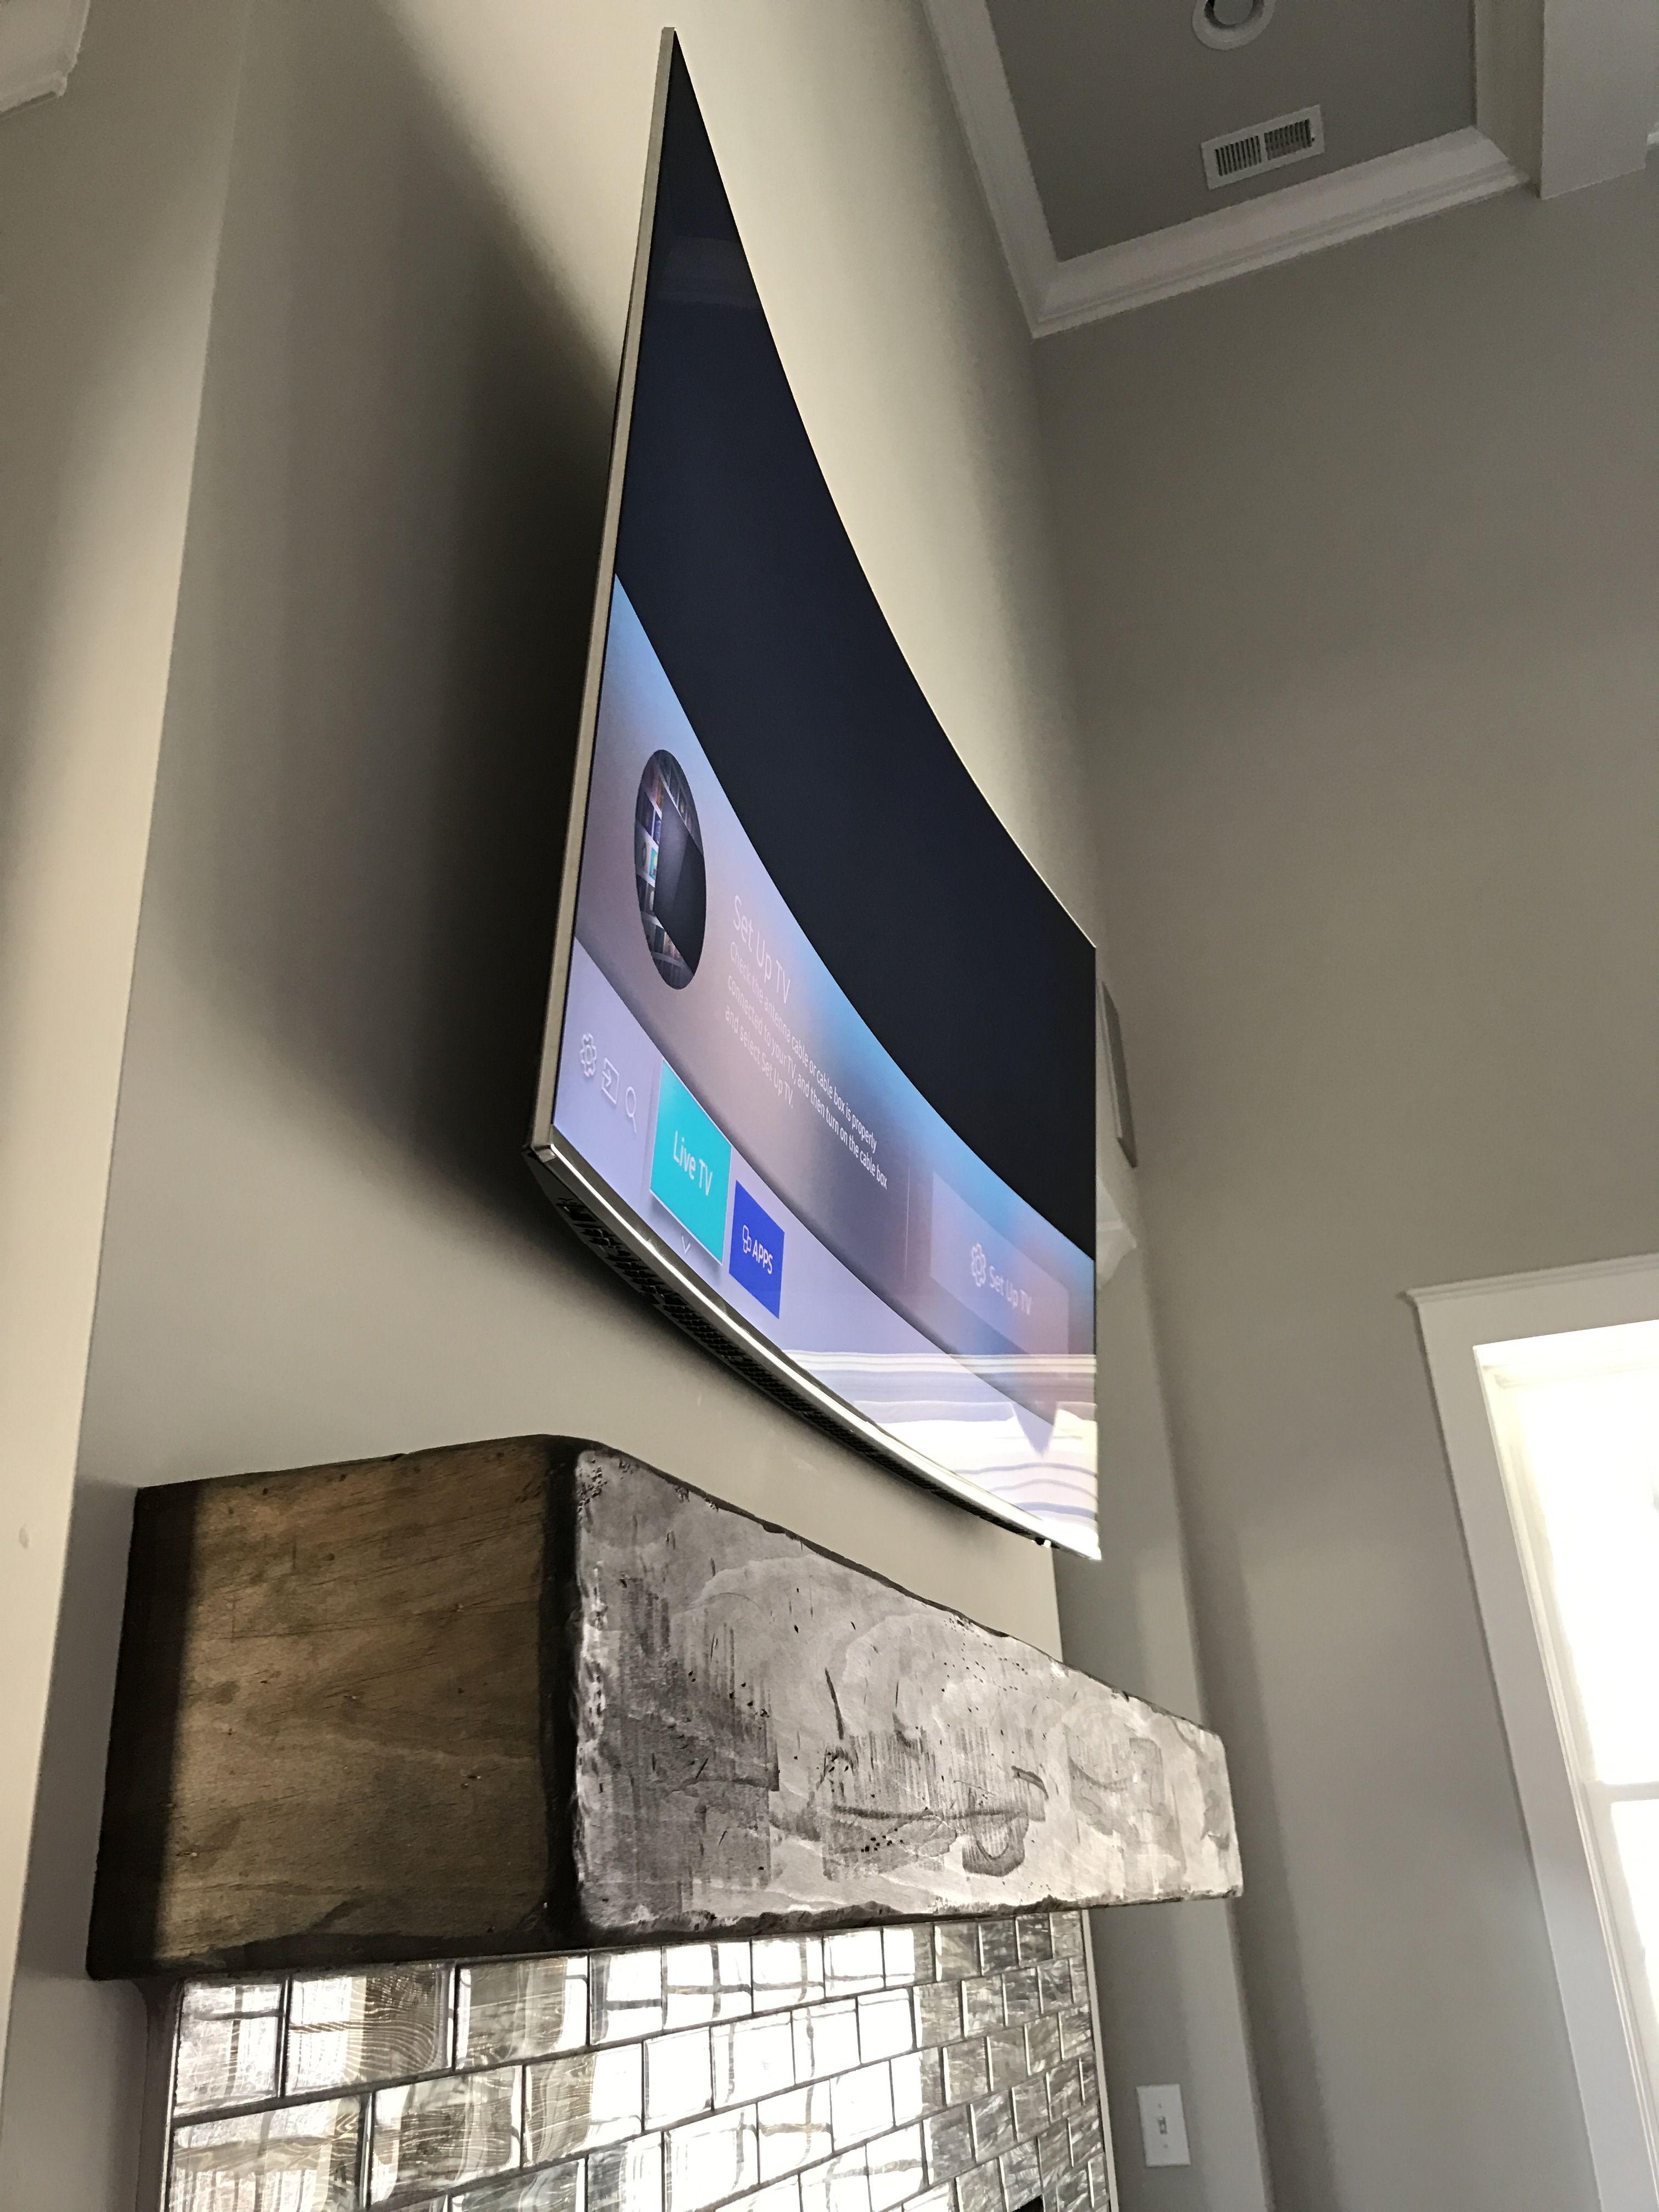 Living Room Curved Tv Raleigh Nc Curved Tvs Living Room Tv Wall Elegant Living Room Design #two #tv #living #room #setup